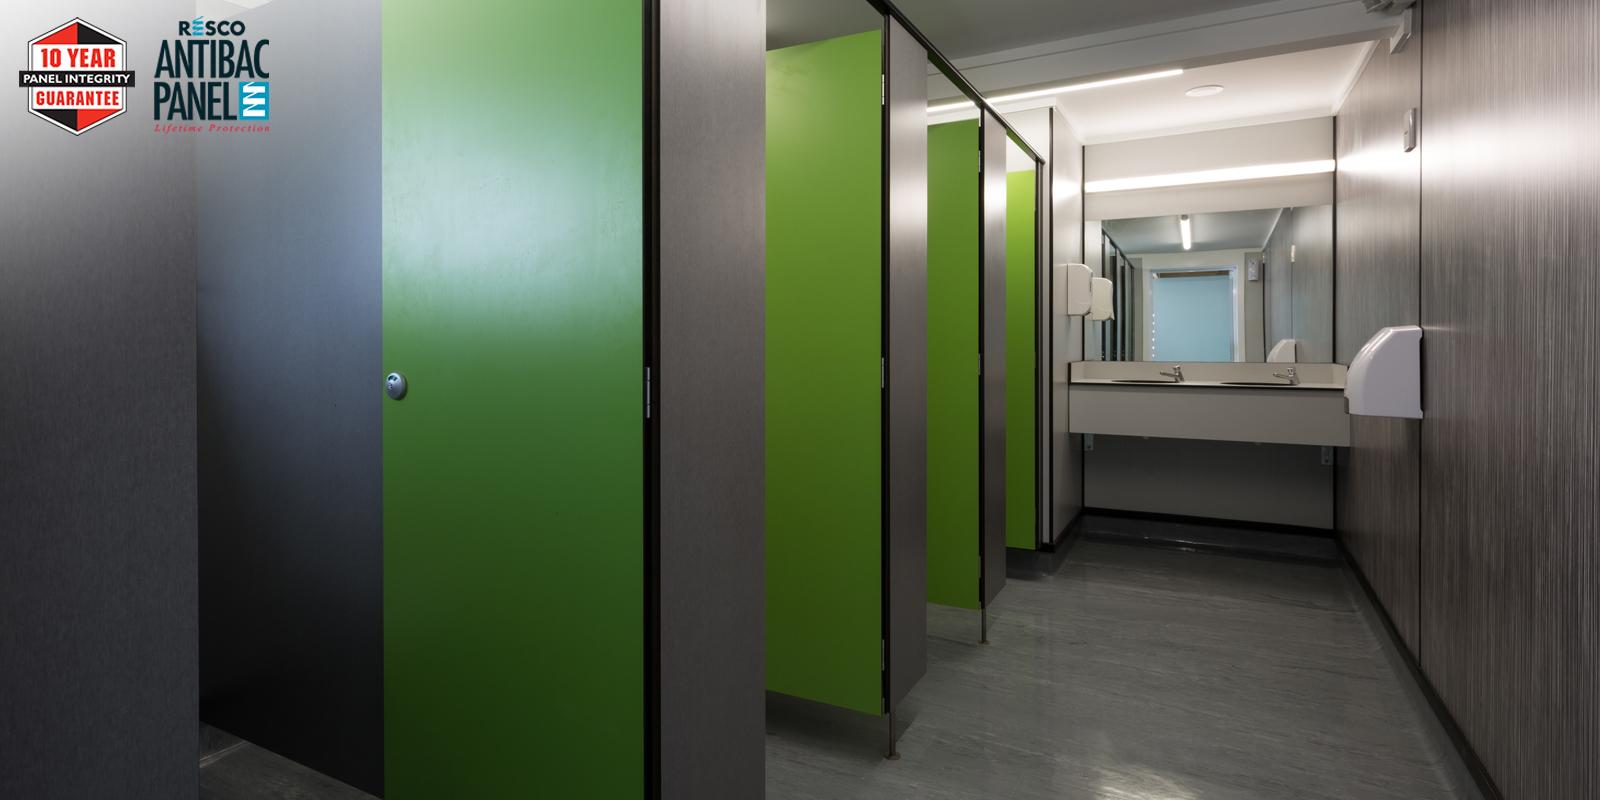 Robust Resco Panels and Partitions Brighten School Toilet Block.